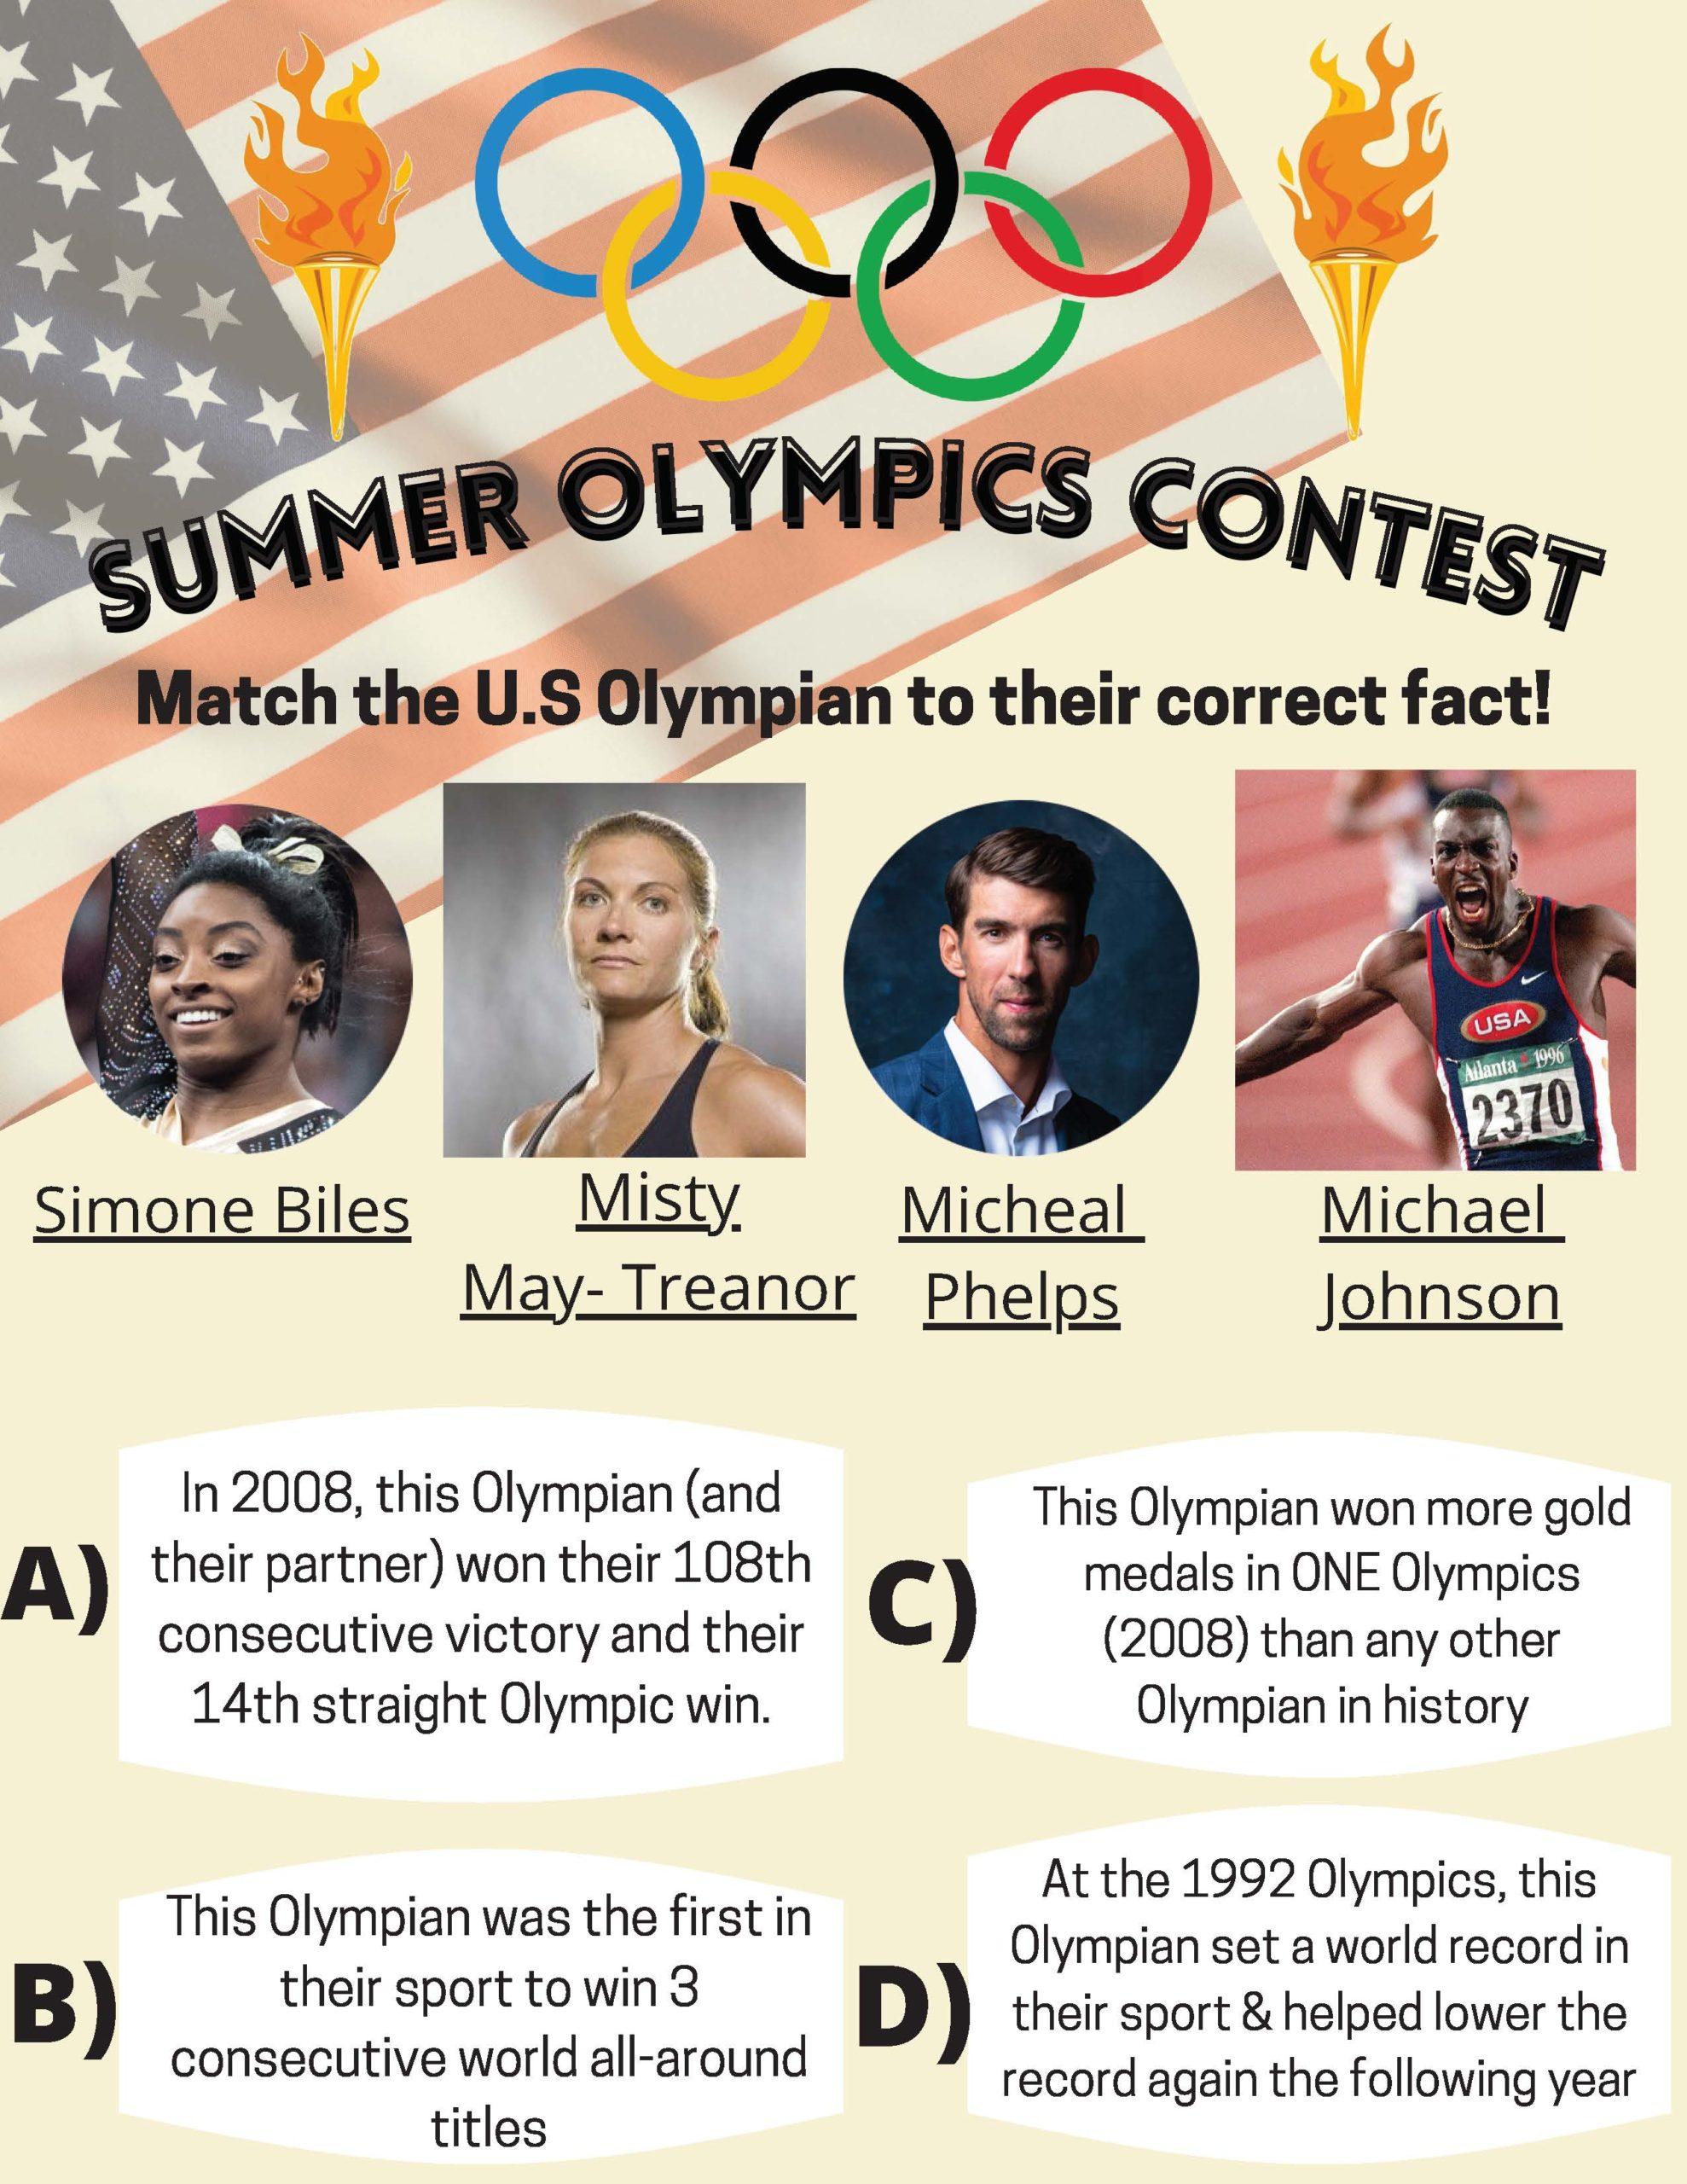 Summer 2021 Olympics Contest